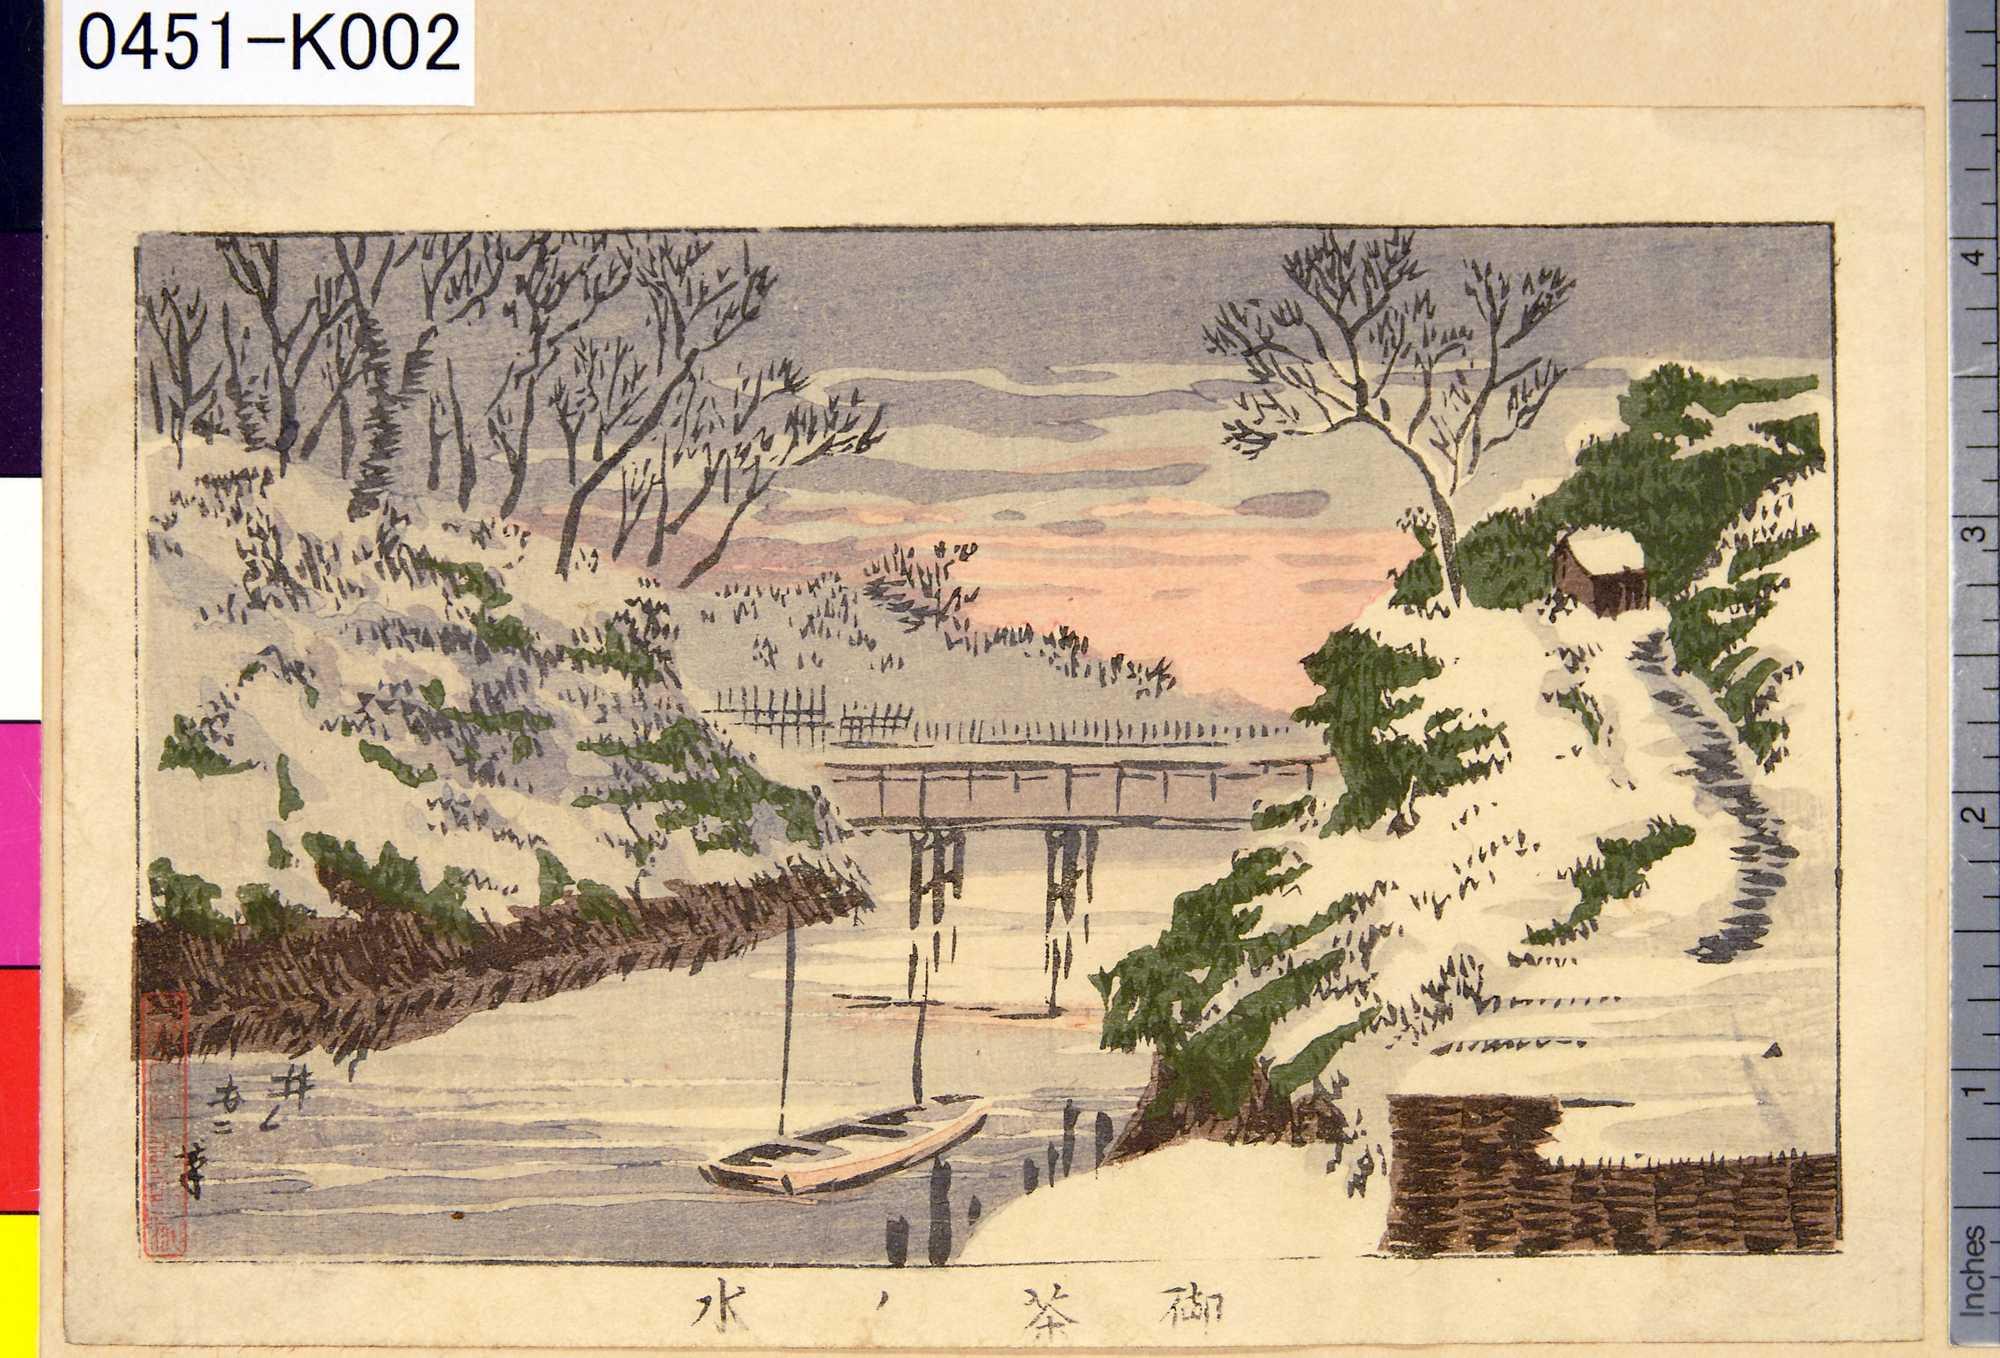 井上安治の画像 p1_33